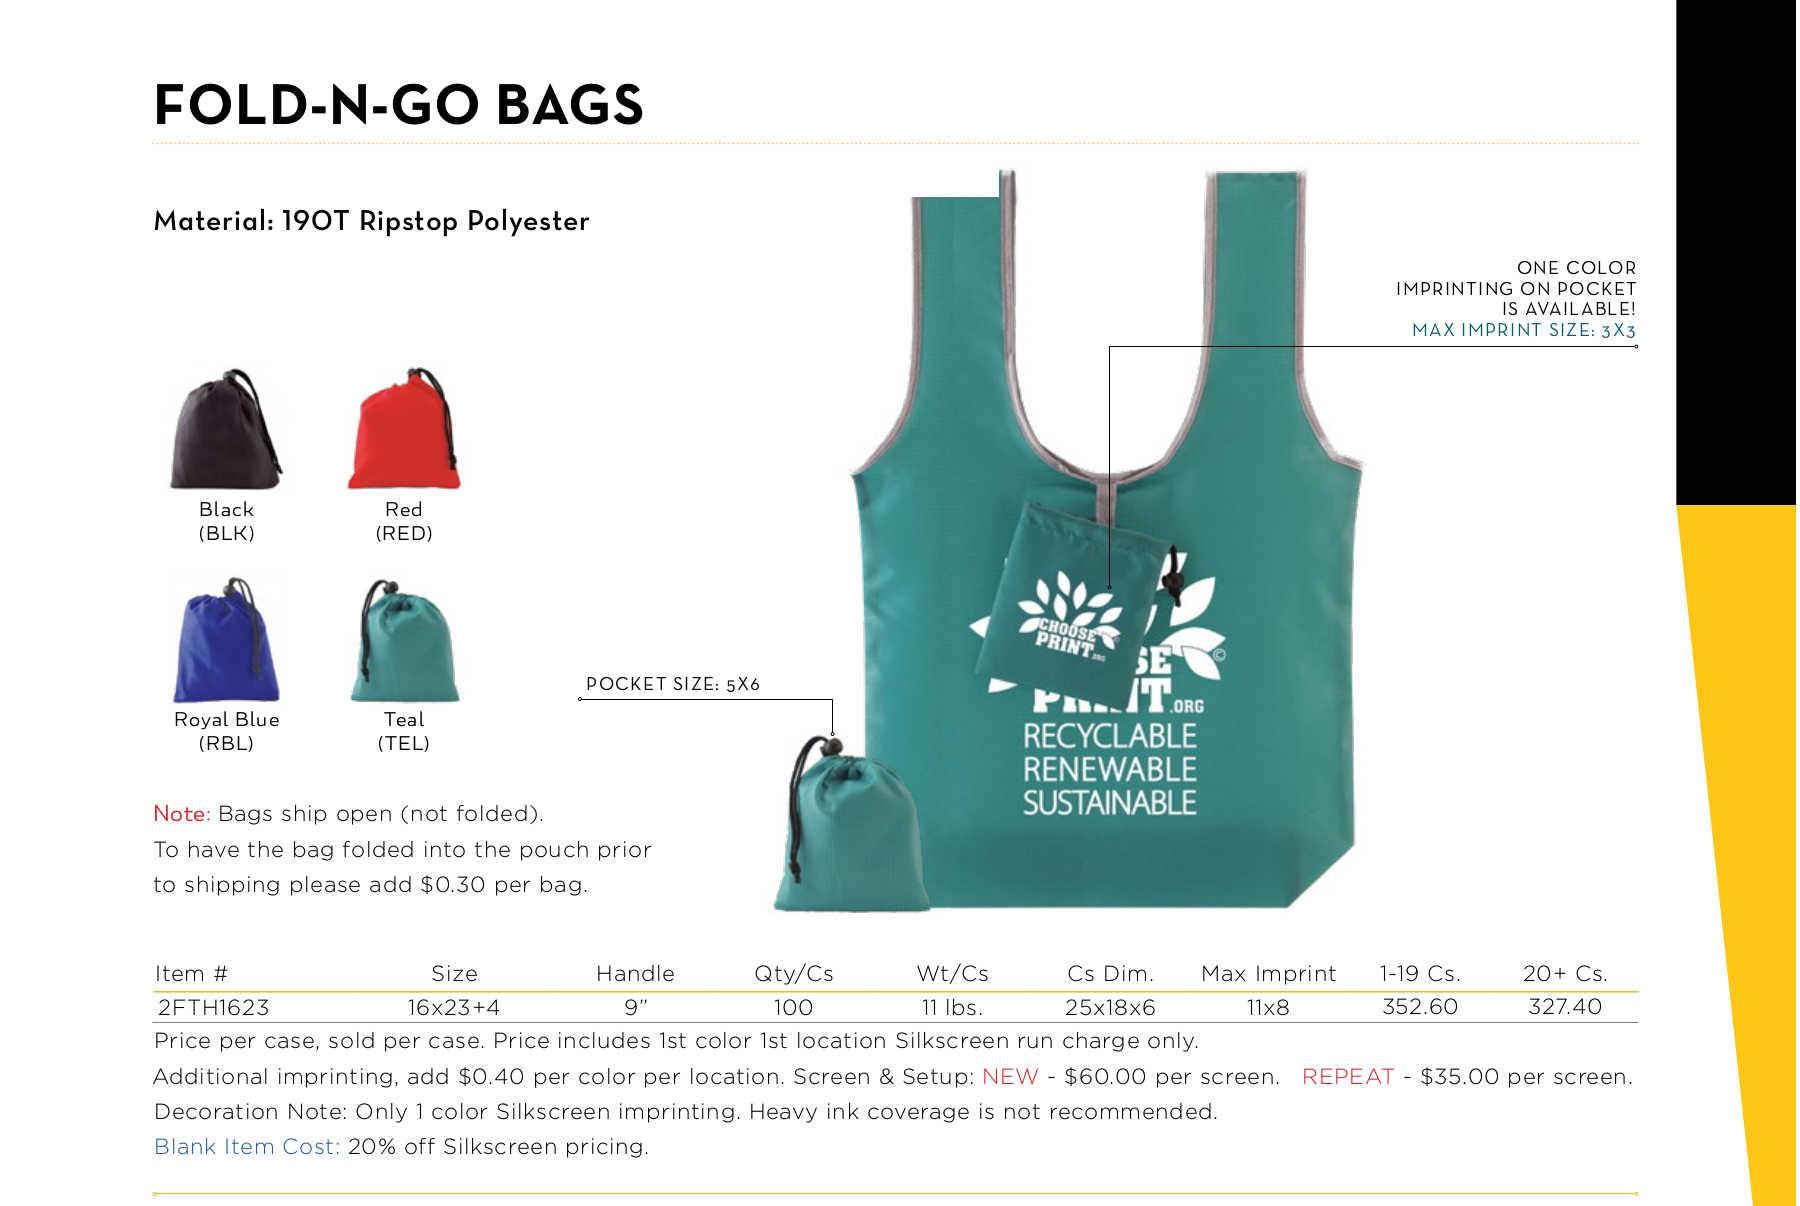 Fold-N-Go Bags